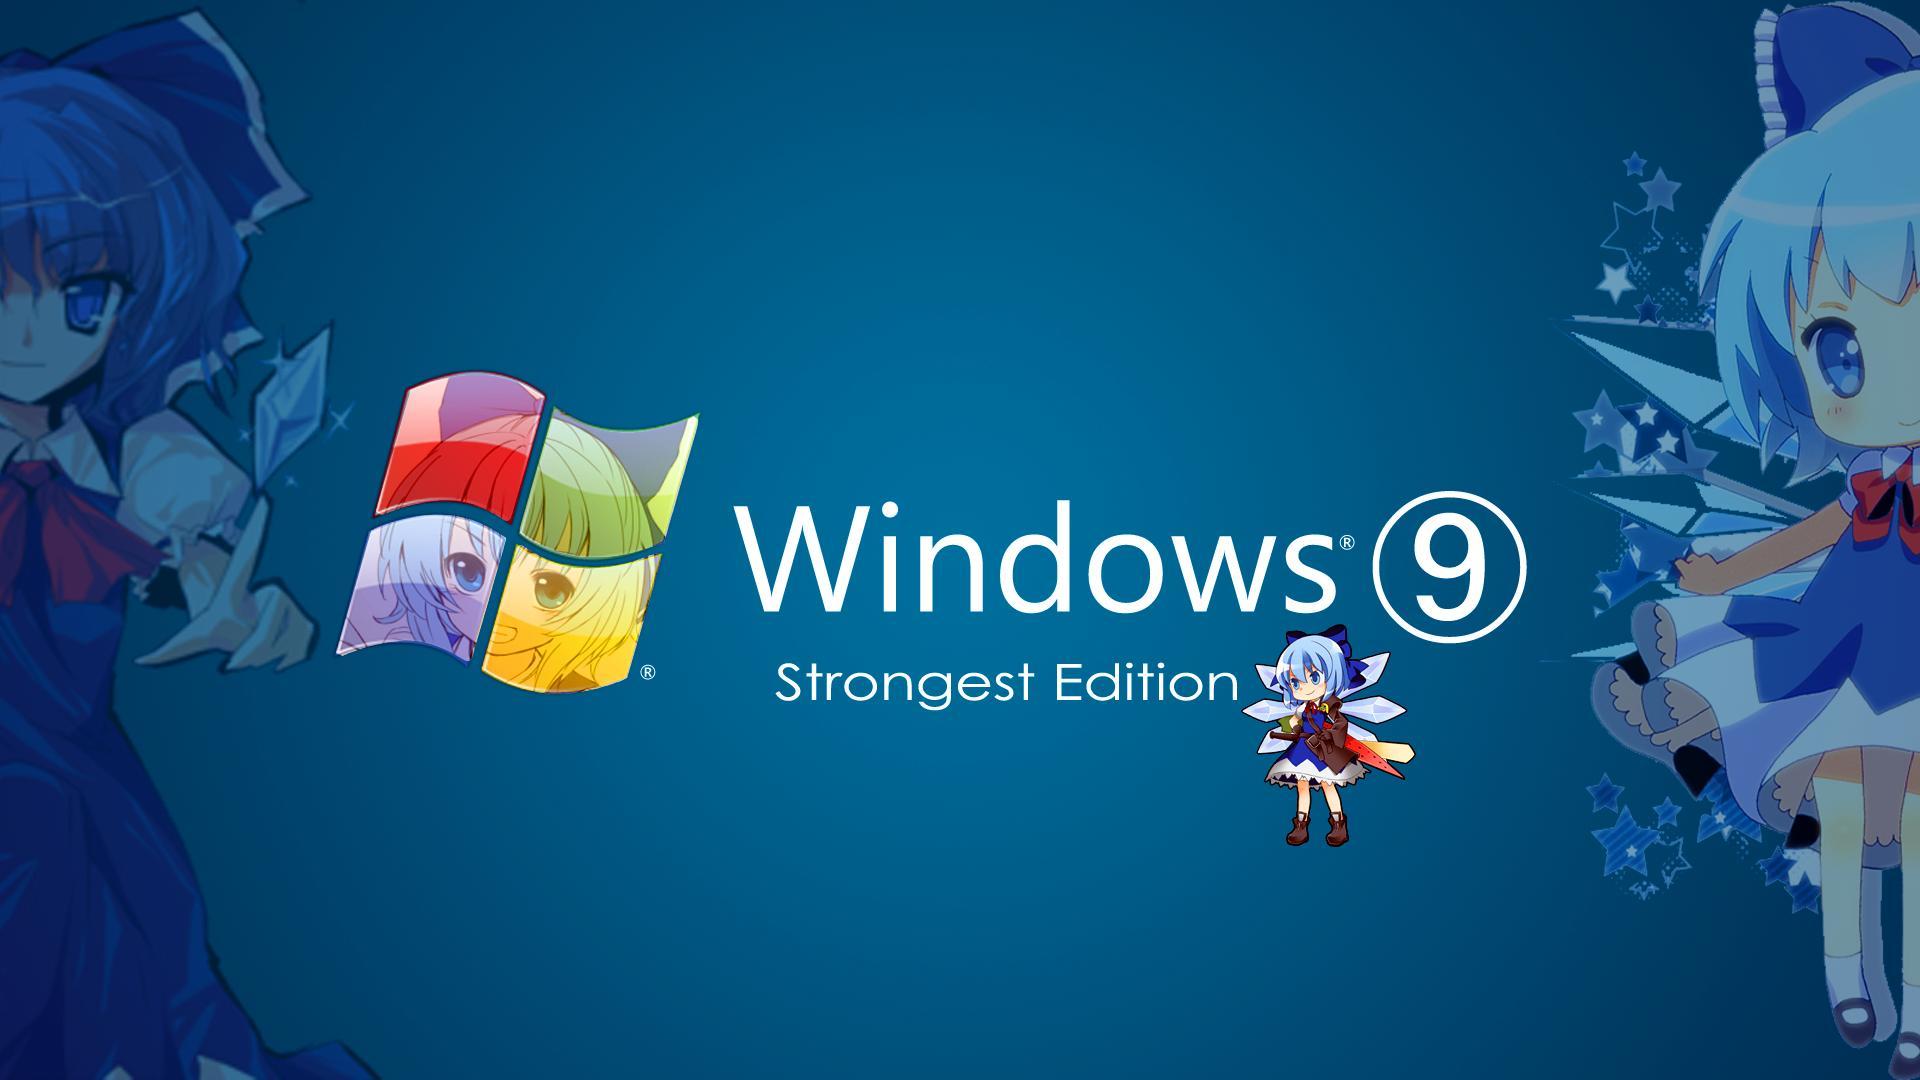 Latest Windows  Hd Wallpaper Free Download Hd Free Wallpapers